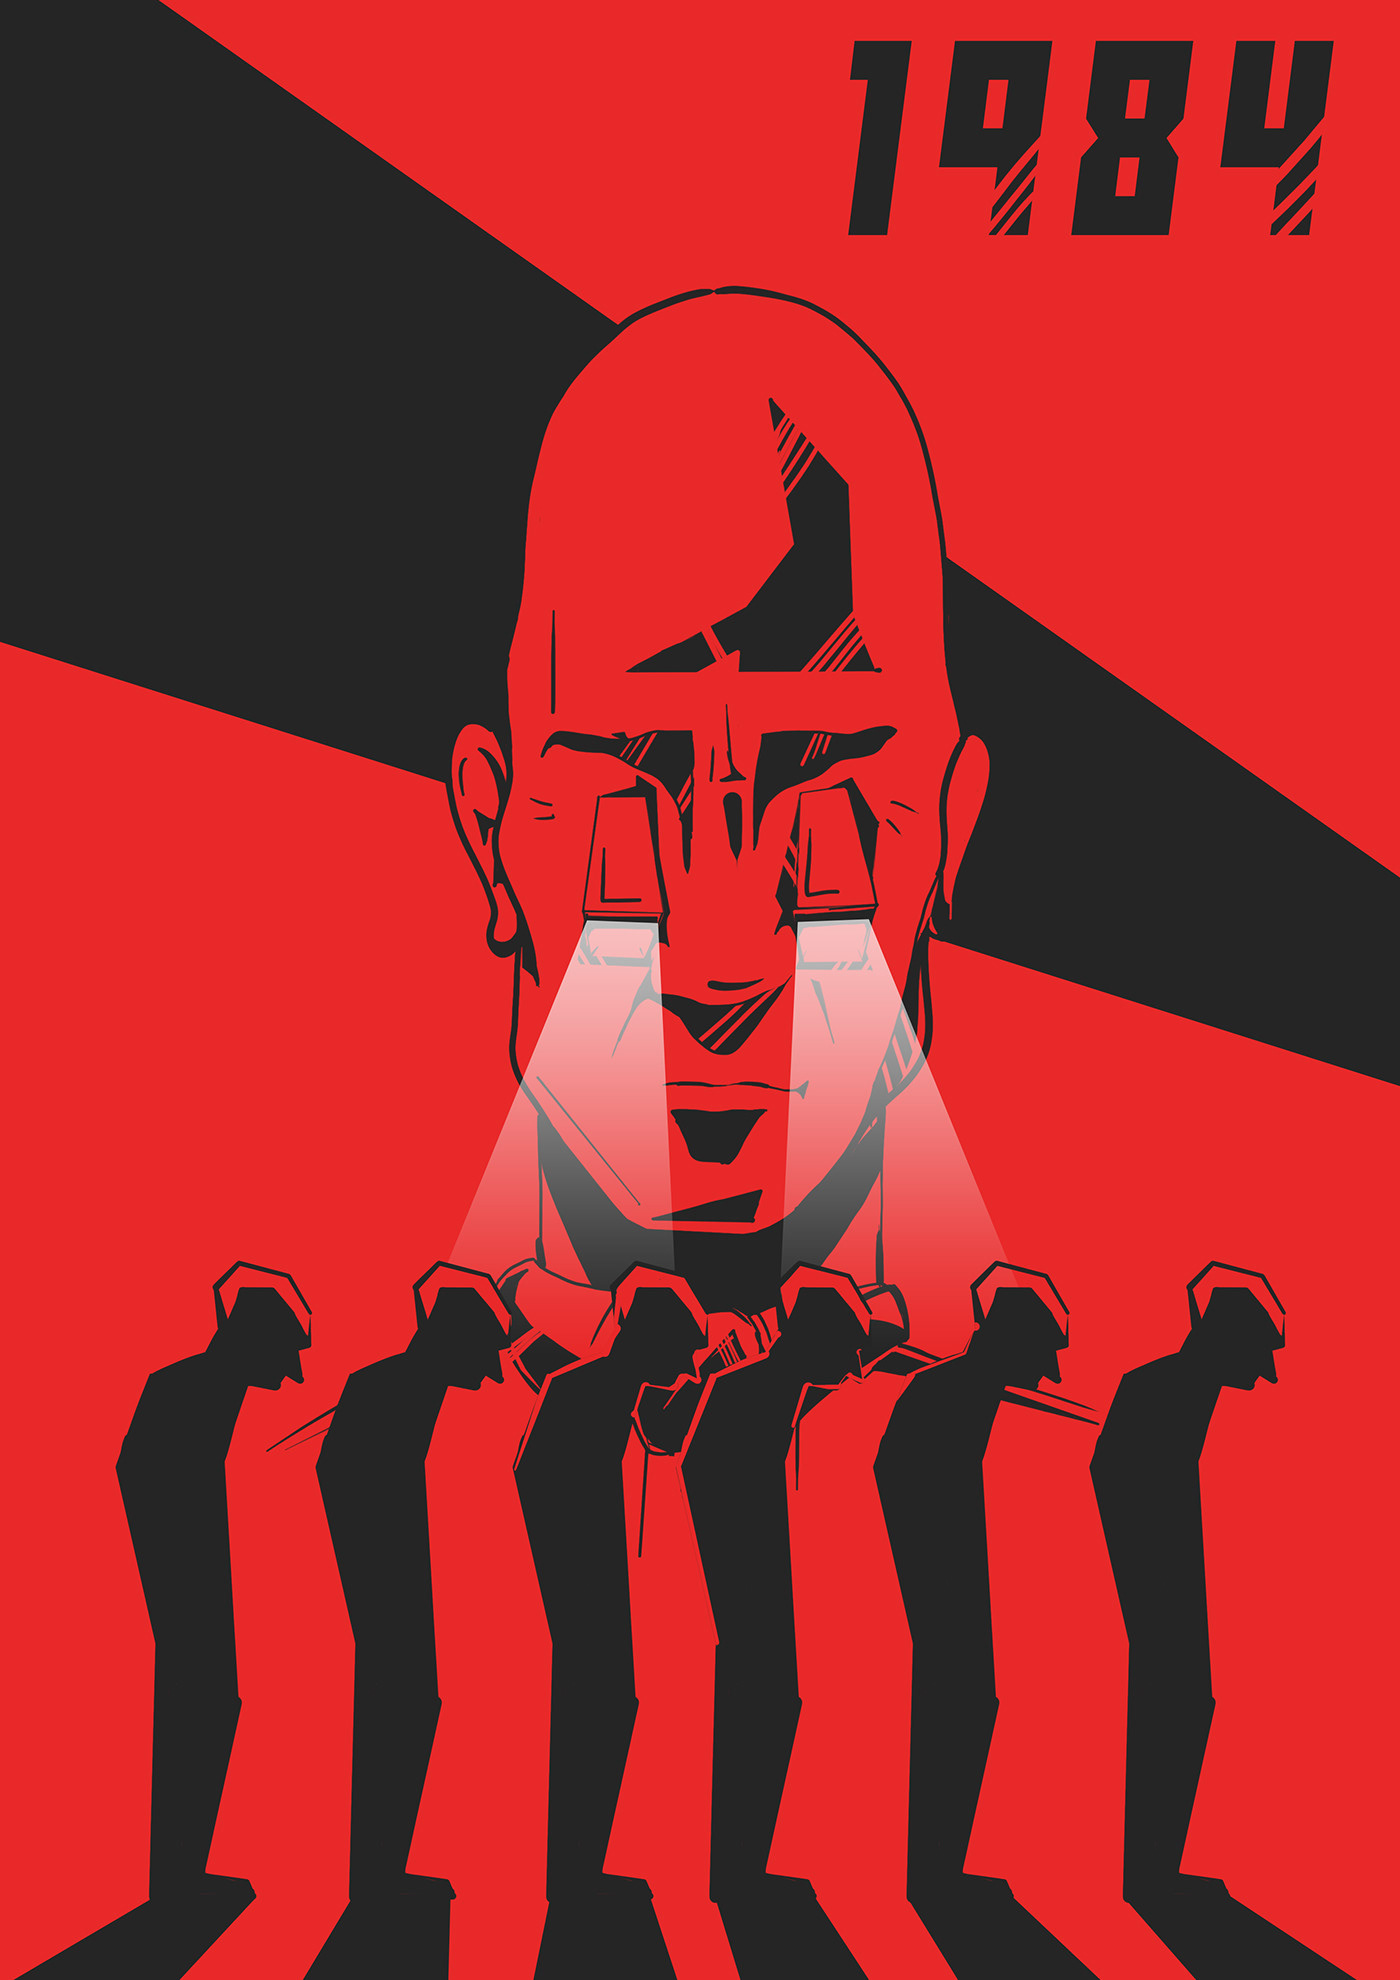 1984 - George Orwell on Behance